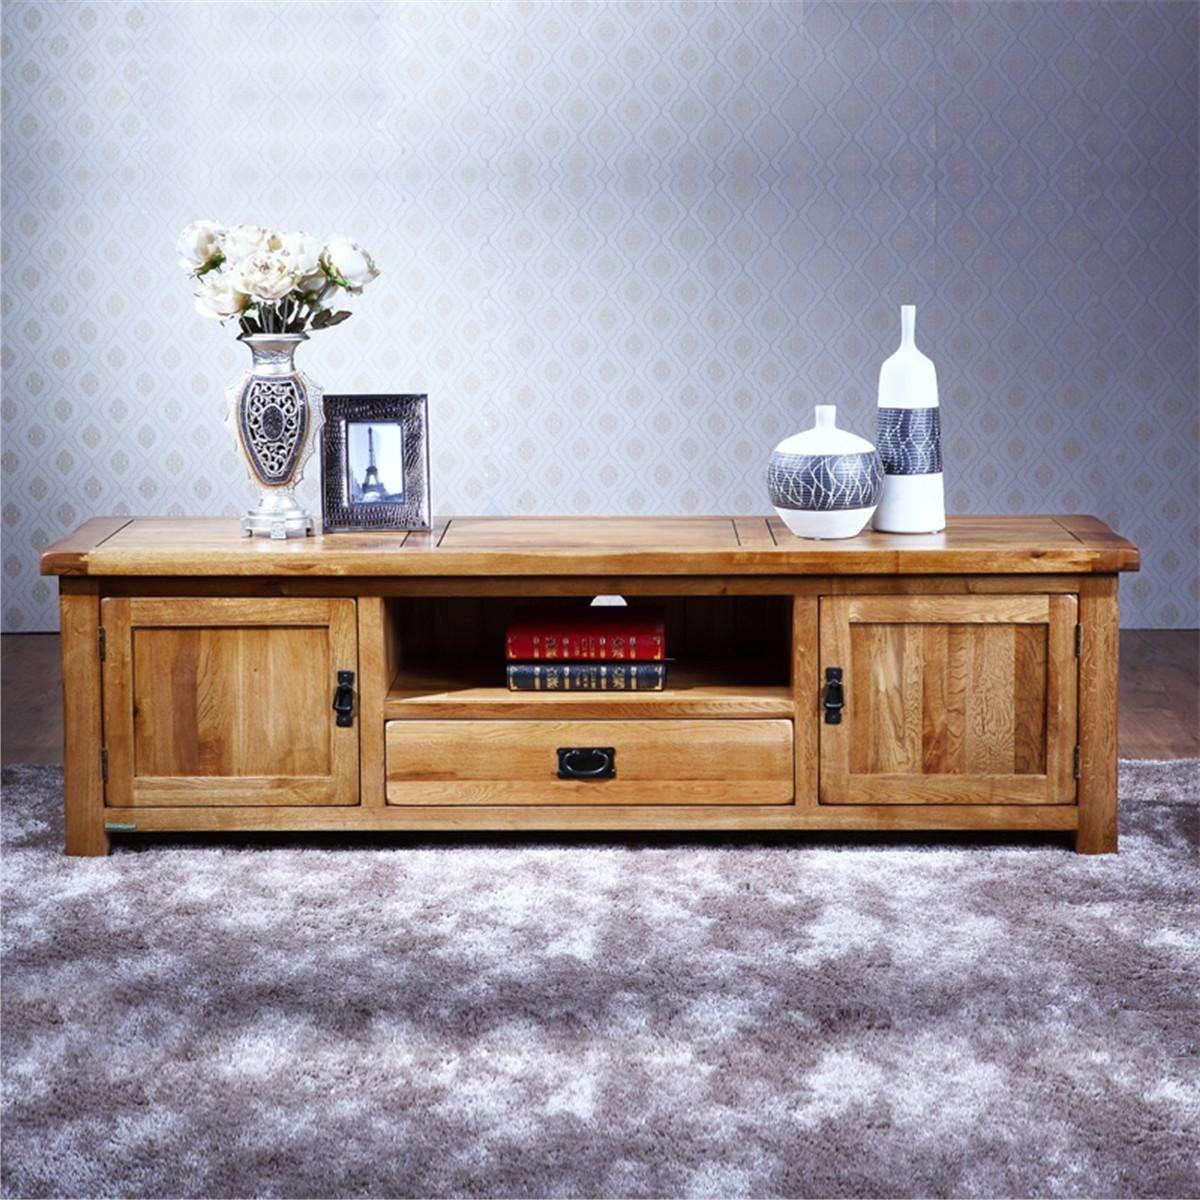 Honey Oak Tv Stand : Innovative Designs Oak Tv Console – Marku With Tv Stands In Oak (View 7 of 15)